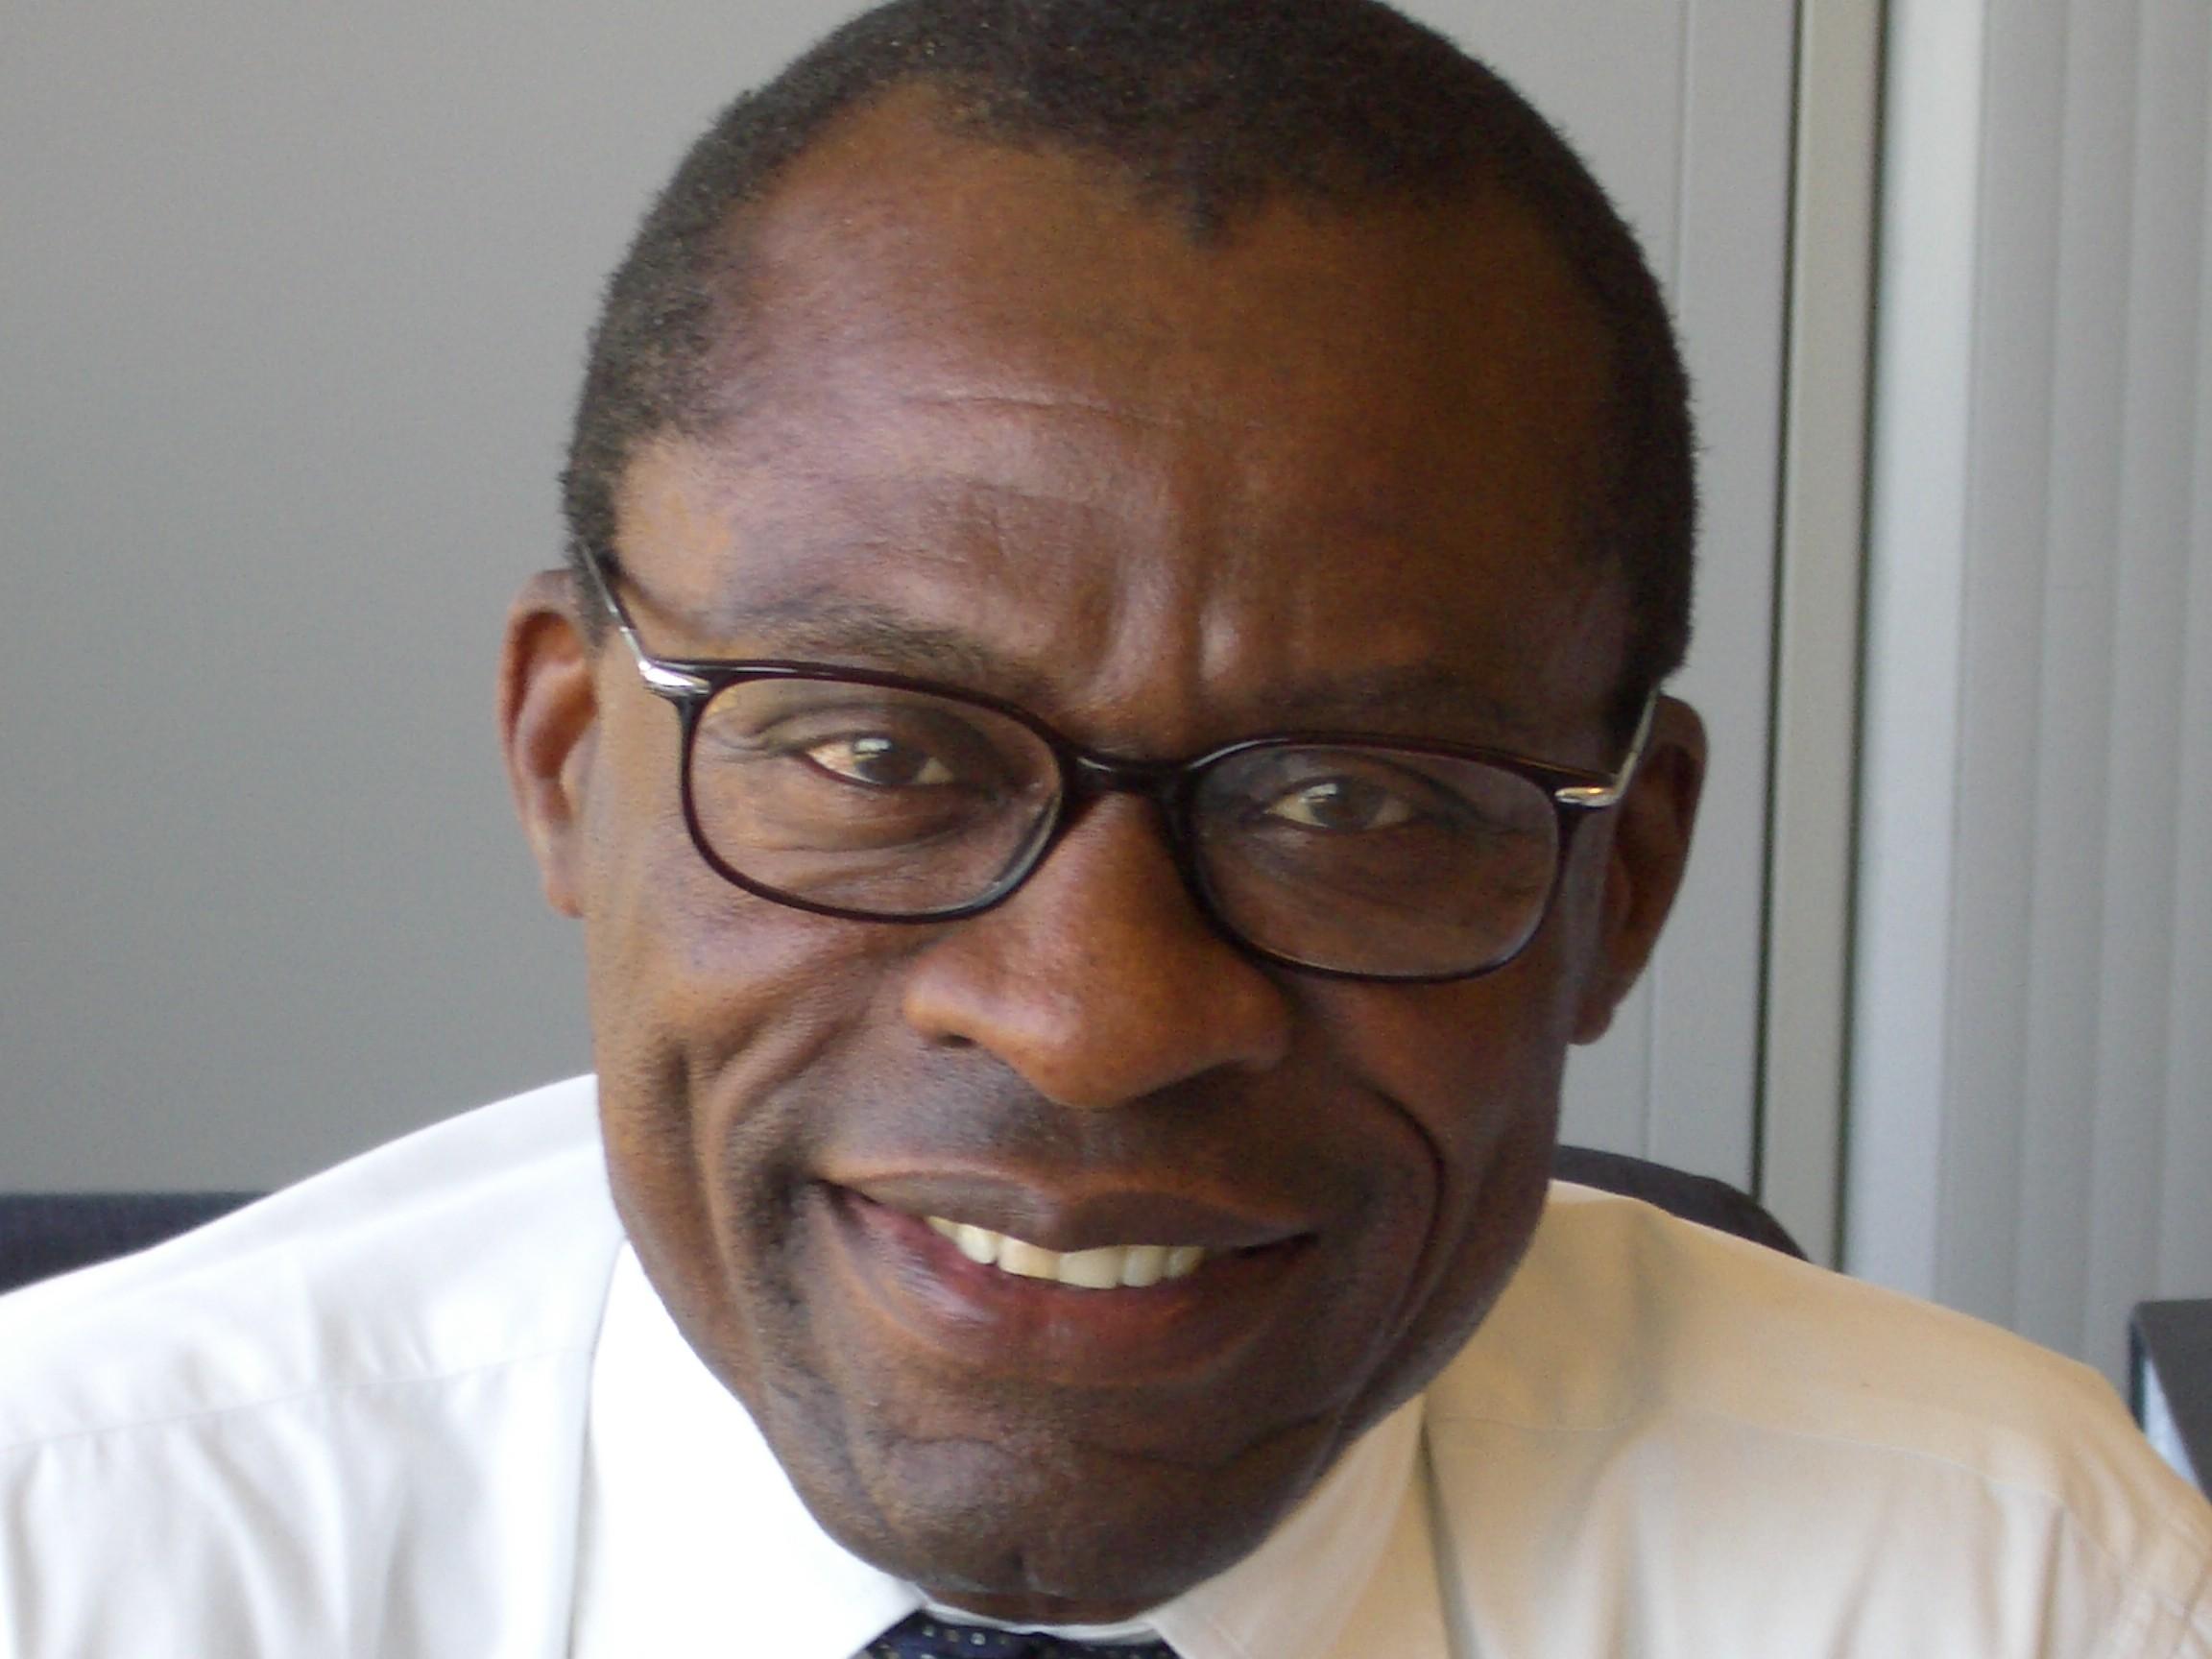 VERS UNE PÉRIODE D'INCERTITUDE AU CAMEROUN ? (Éditorial de Michel LOBE)